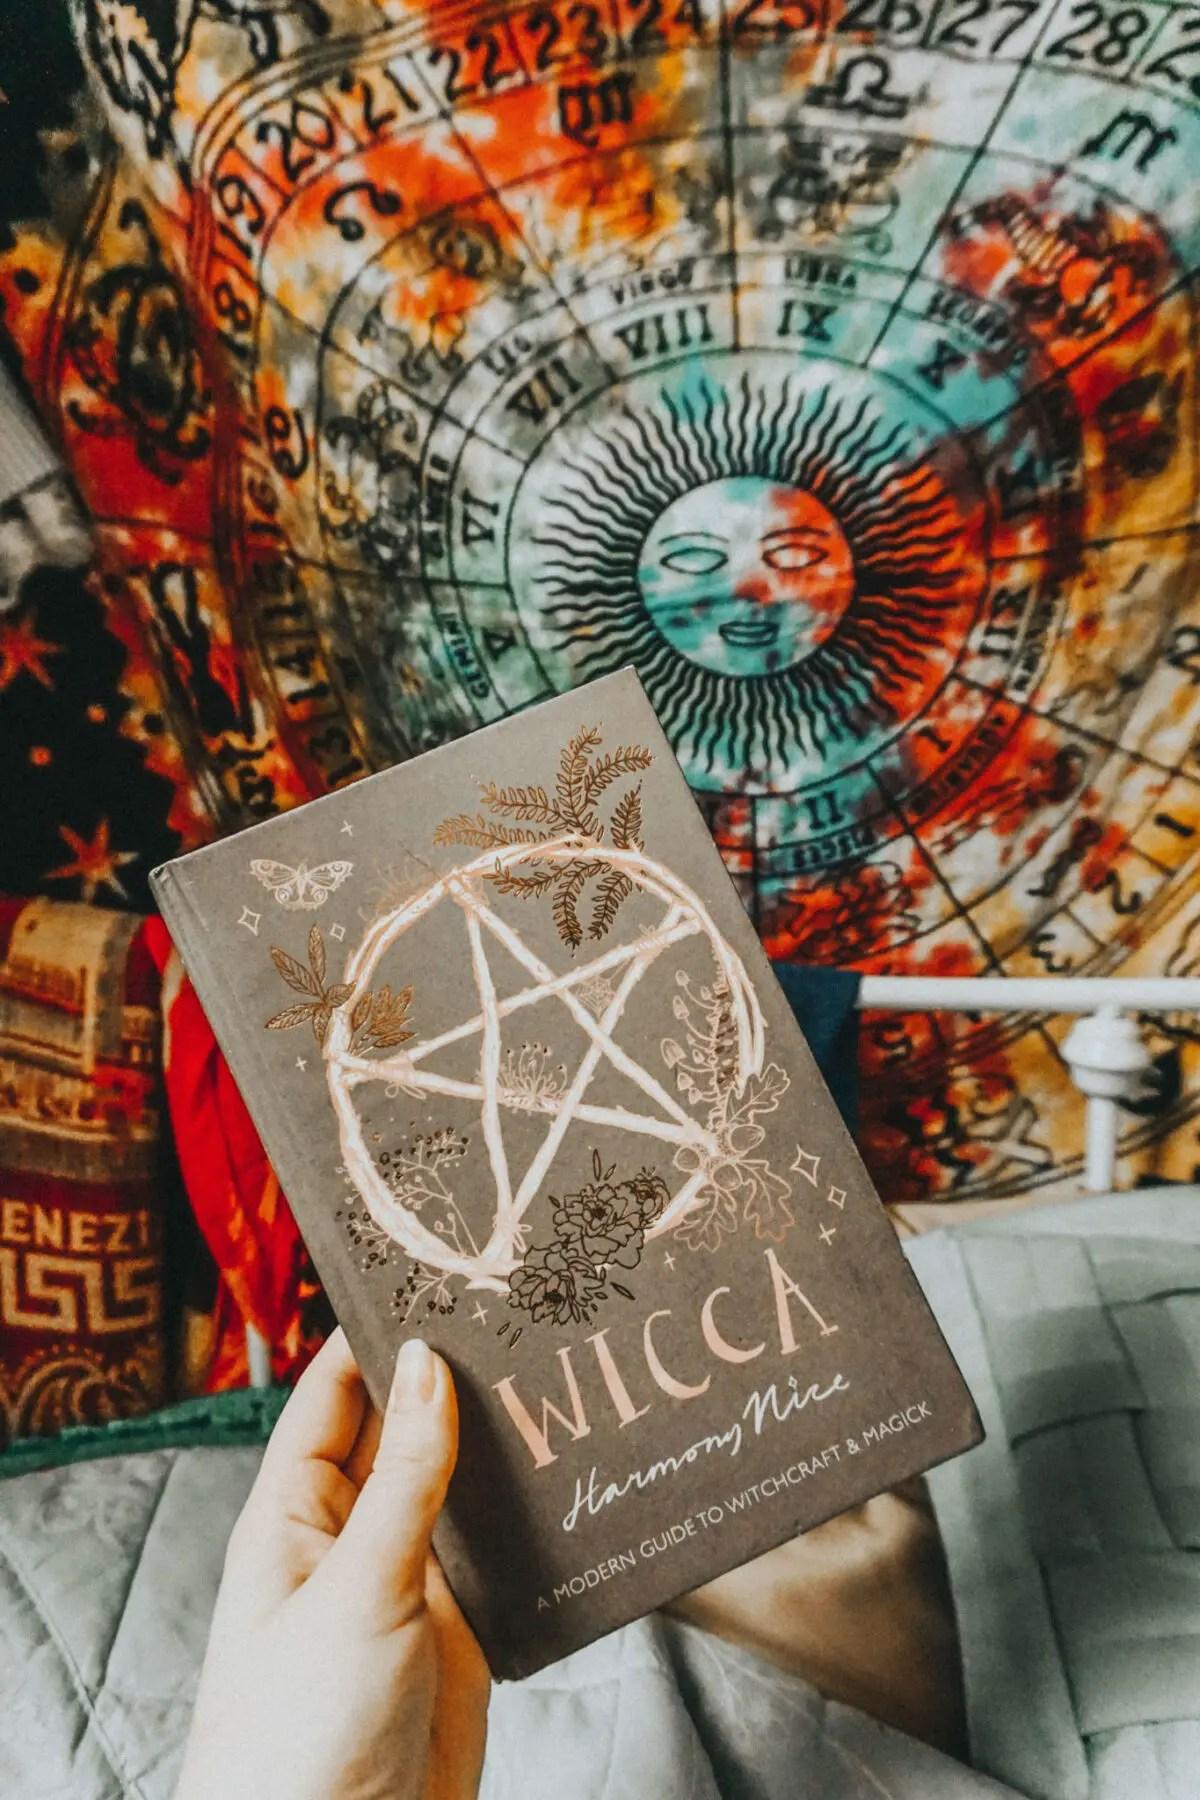 Wicca by Harmony Nice